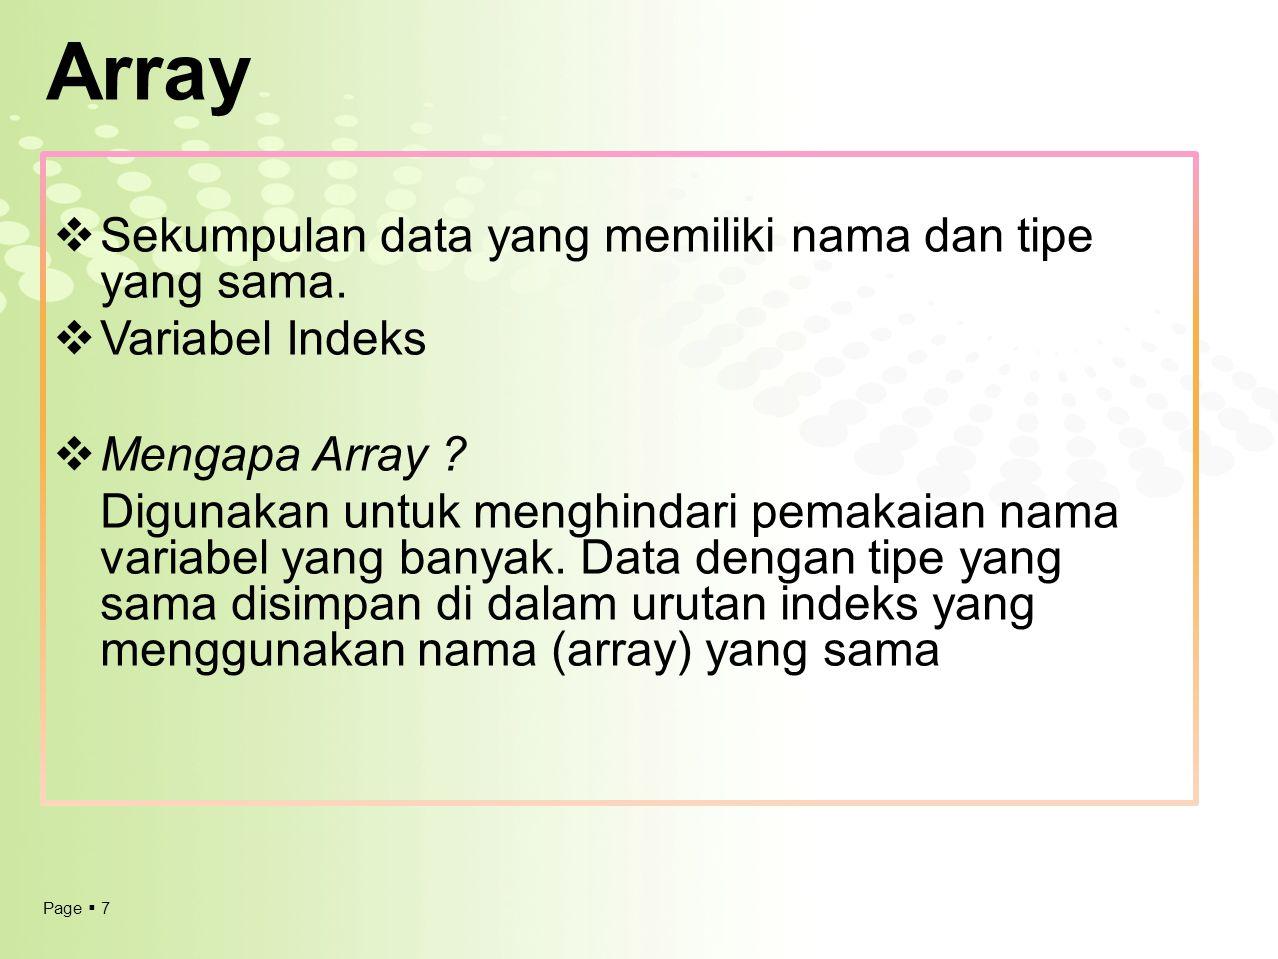 Page  7 Array  Sekumpulan data yang memiliki nama dan tipe yang sama.  Variabel Indeks  Mengapa Array ? Digunakan untuk menghindari pemakaian nama